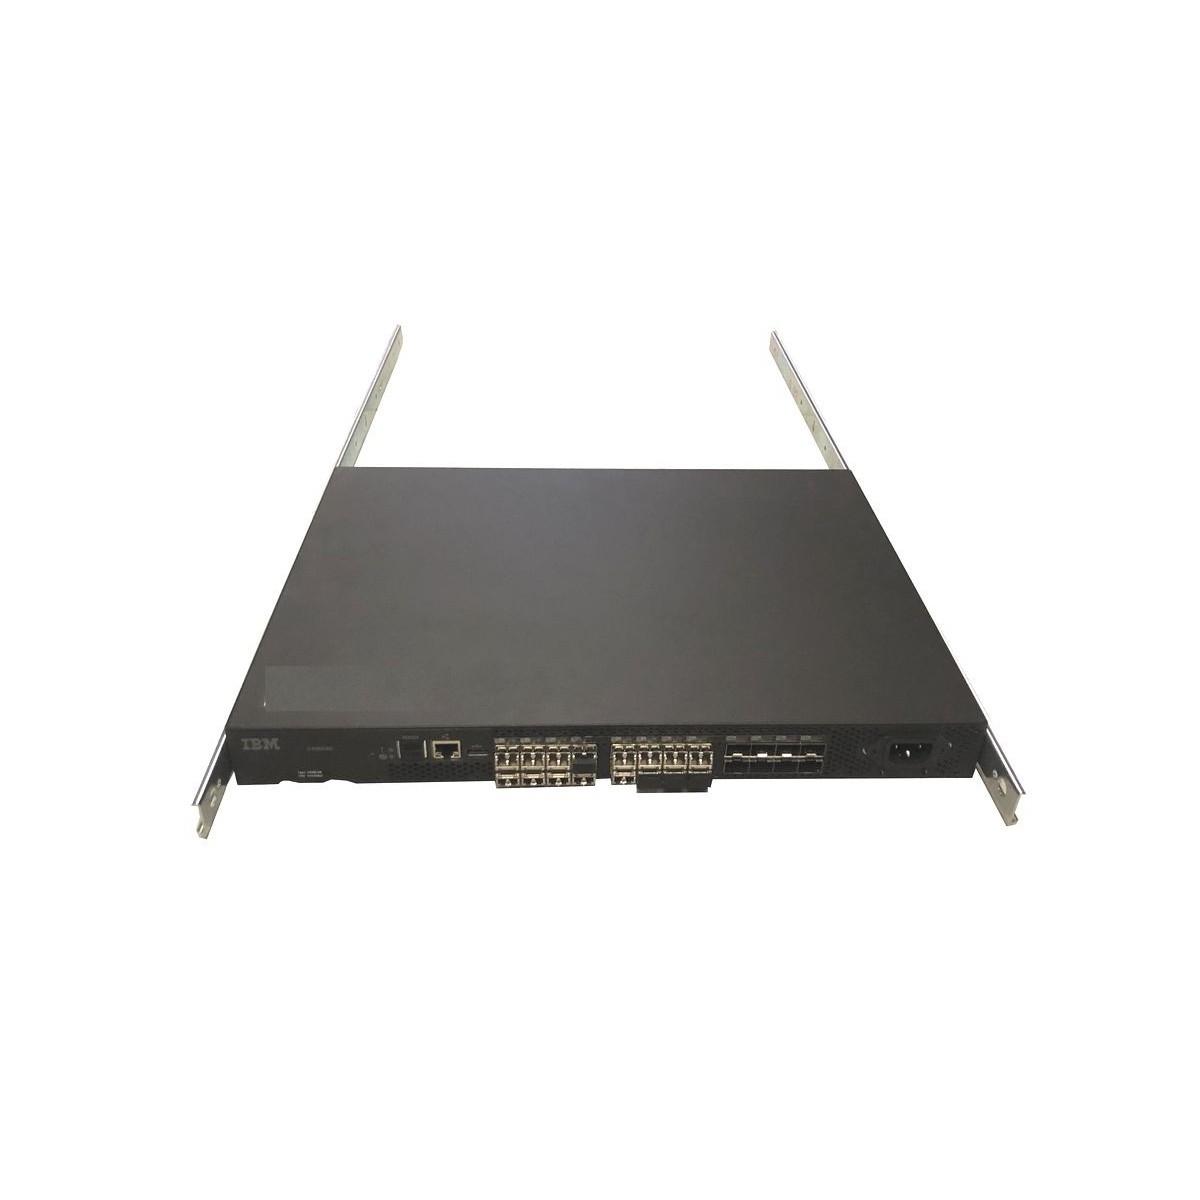 SWITCH IBM SAN24B-4 16xACT PORT 16xGBIC 249824E